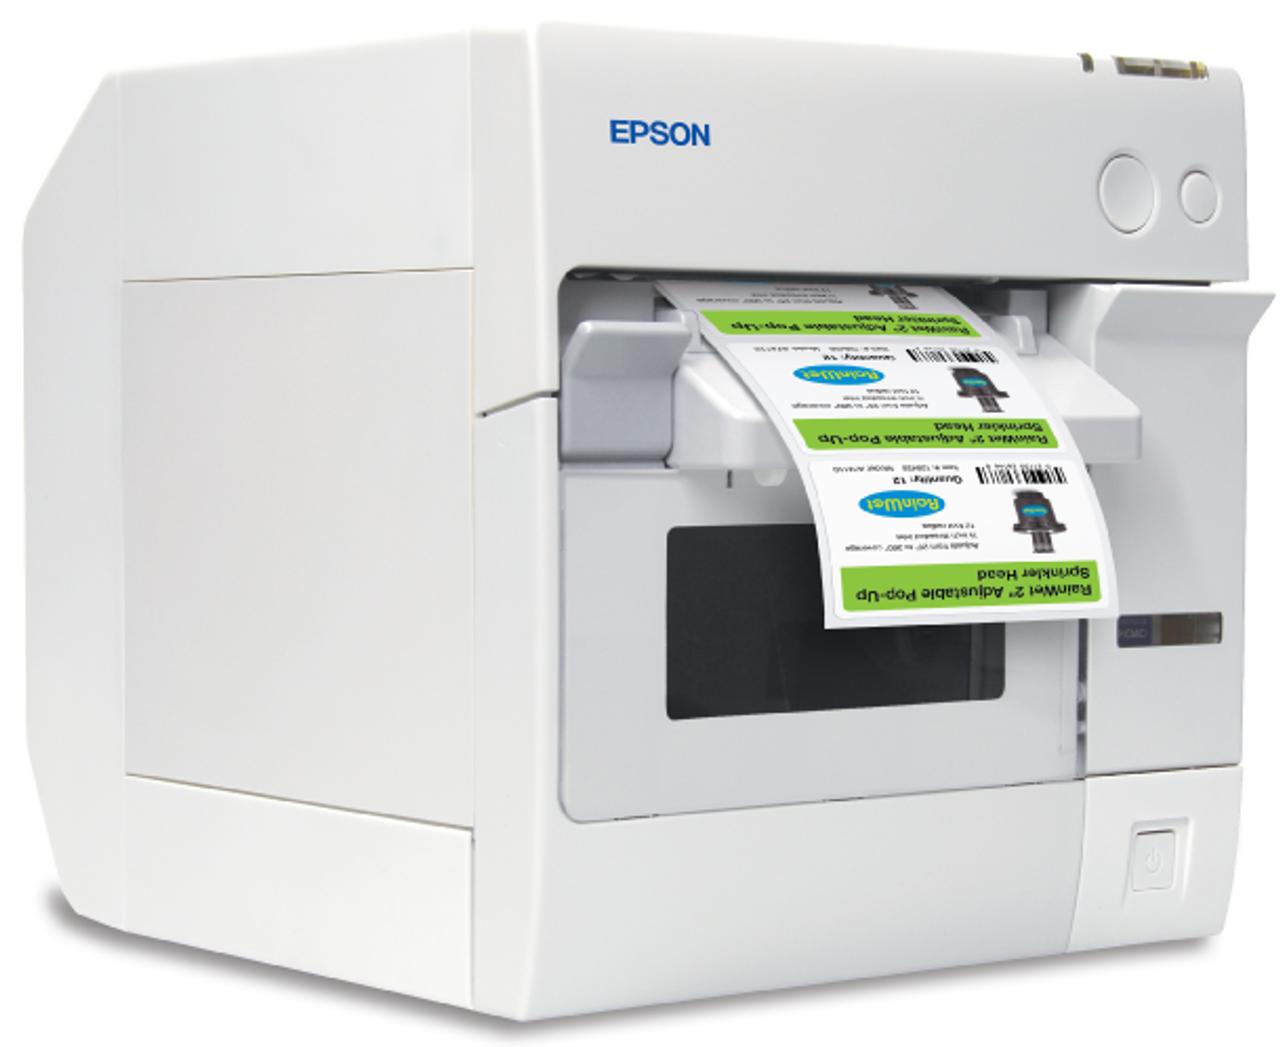 Epson ColorWorks TM-C3400-011 Color Label Printer [USB]